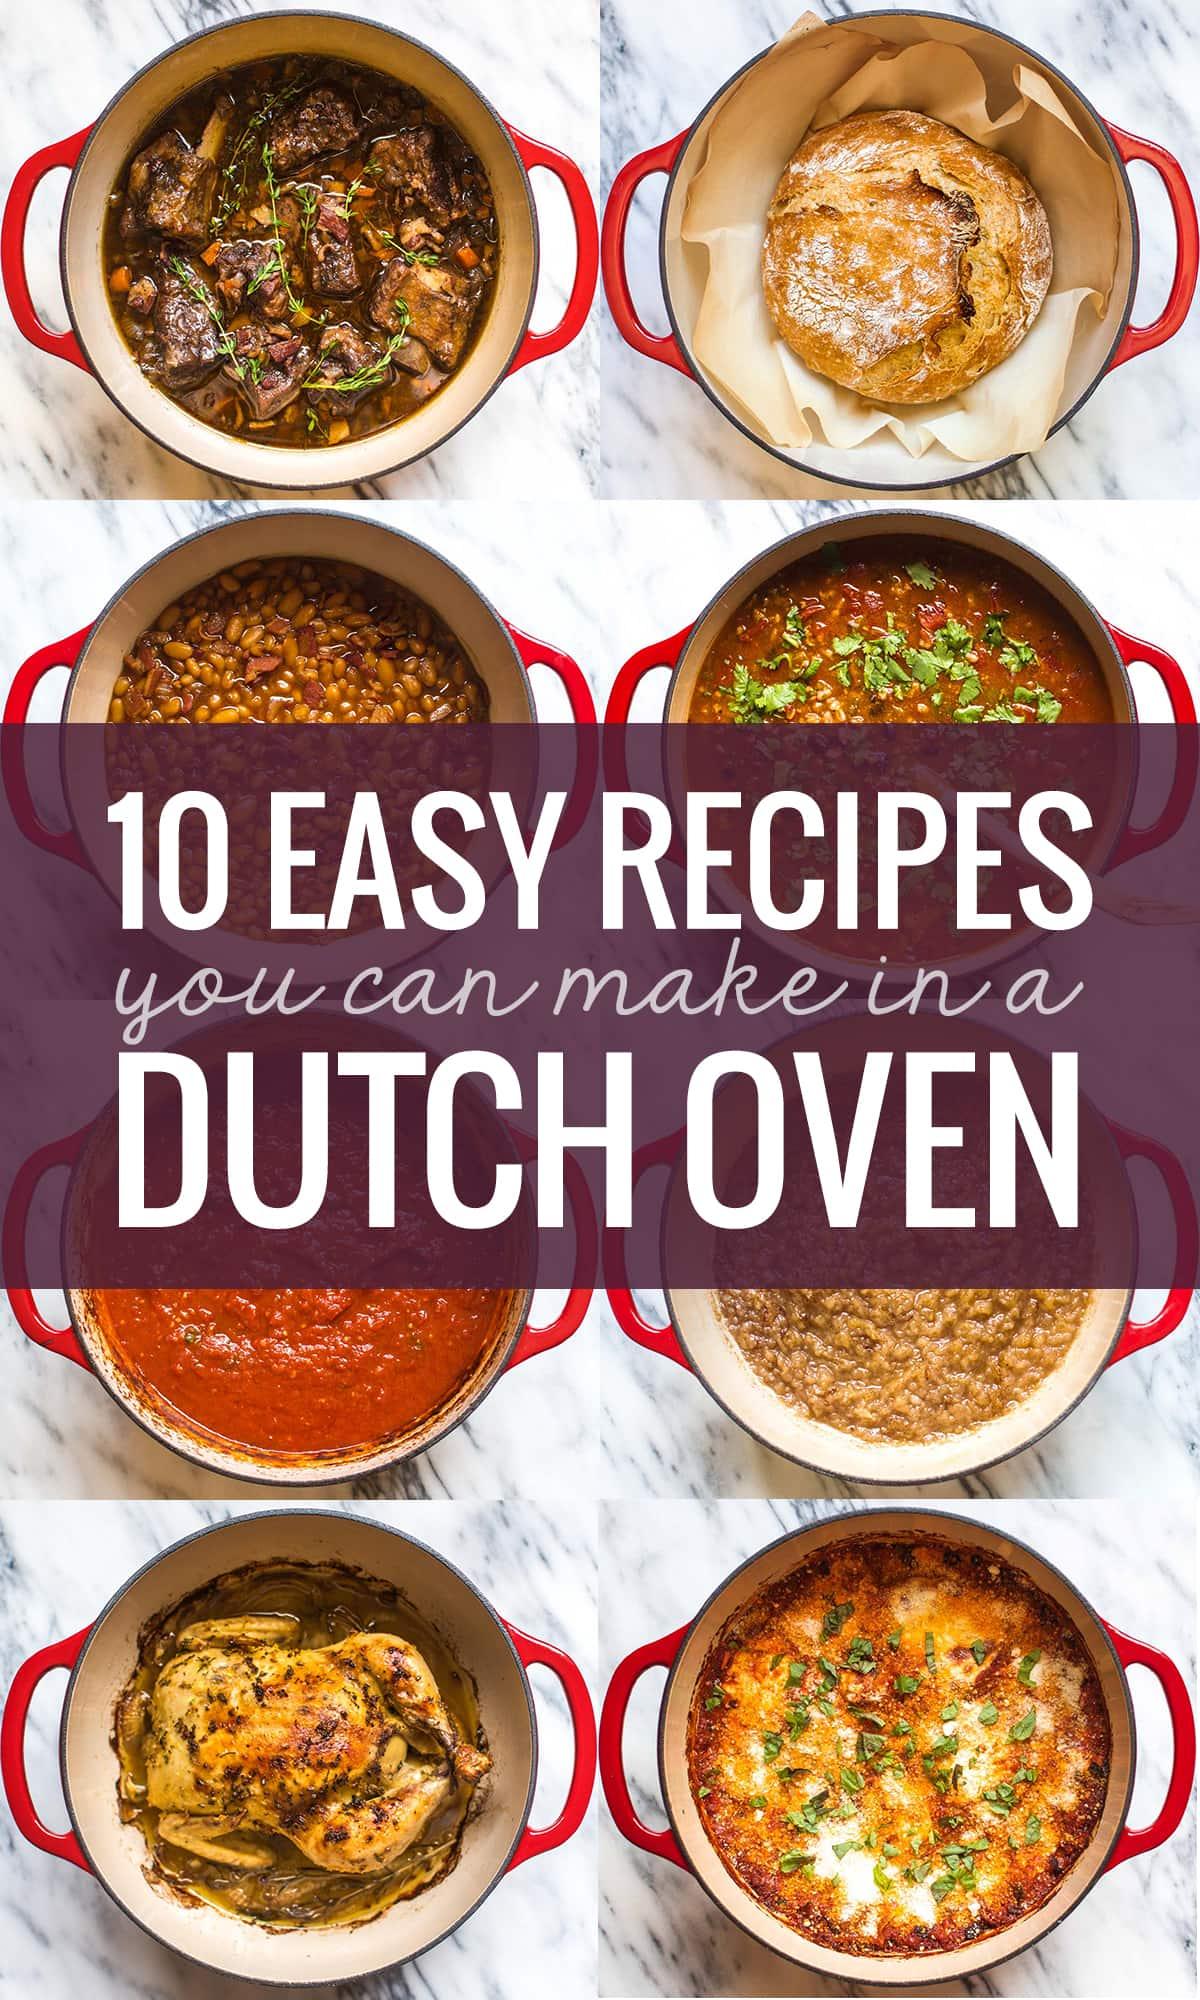 Easy-Recipes-Dutch-Oven.jpg